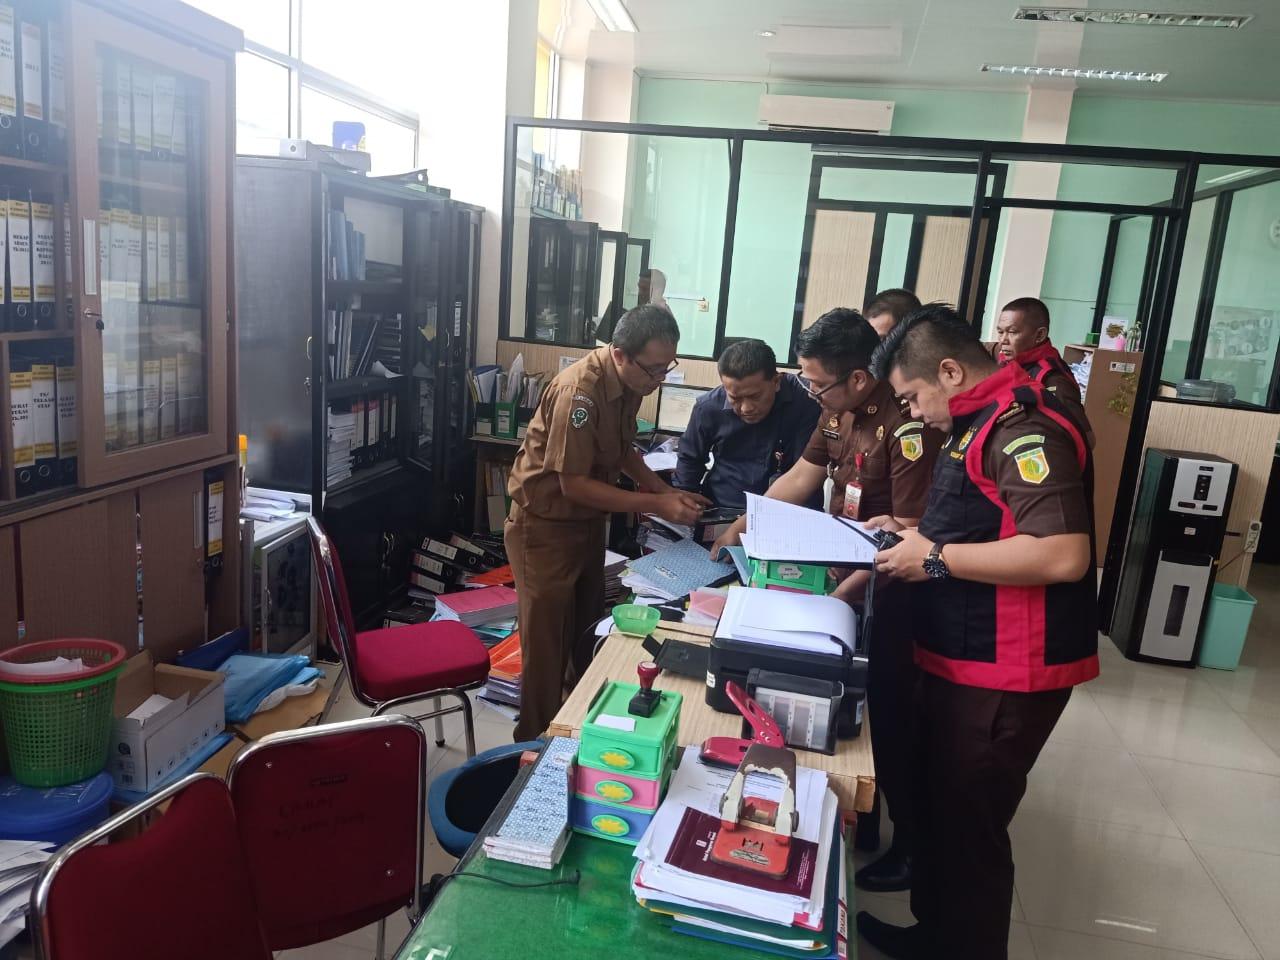 Penyidik dari Kejaksaan Negeri Payakumbuh geledah ruangan RSUD Adnan WD Payakumbuh terkait dugaan korupsi incenerator